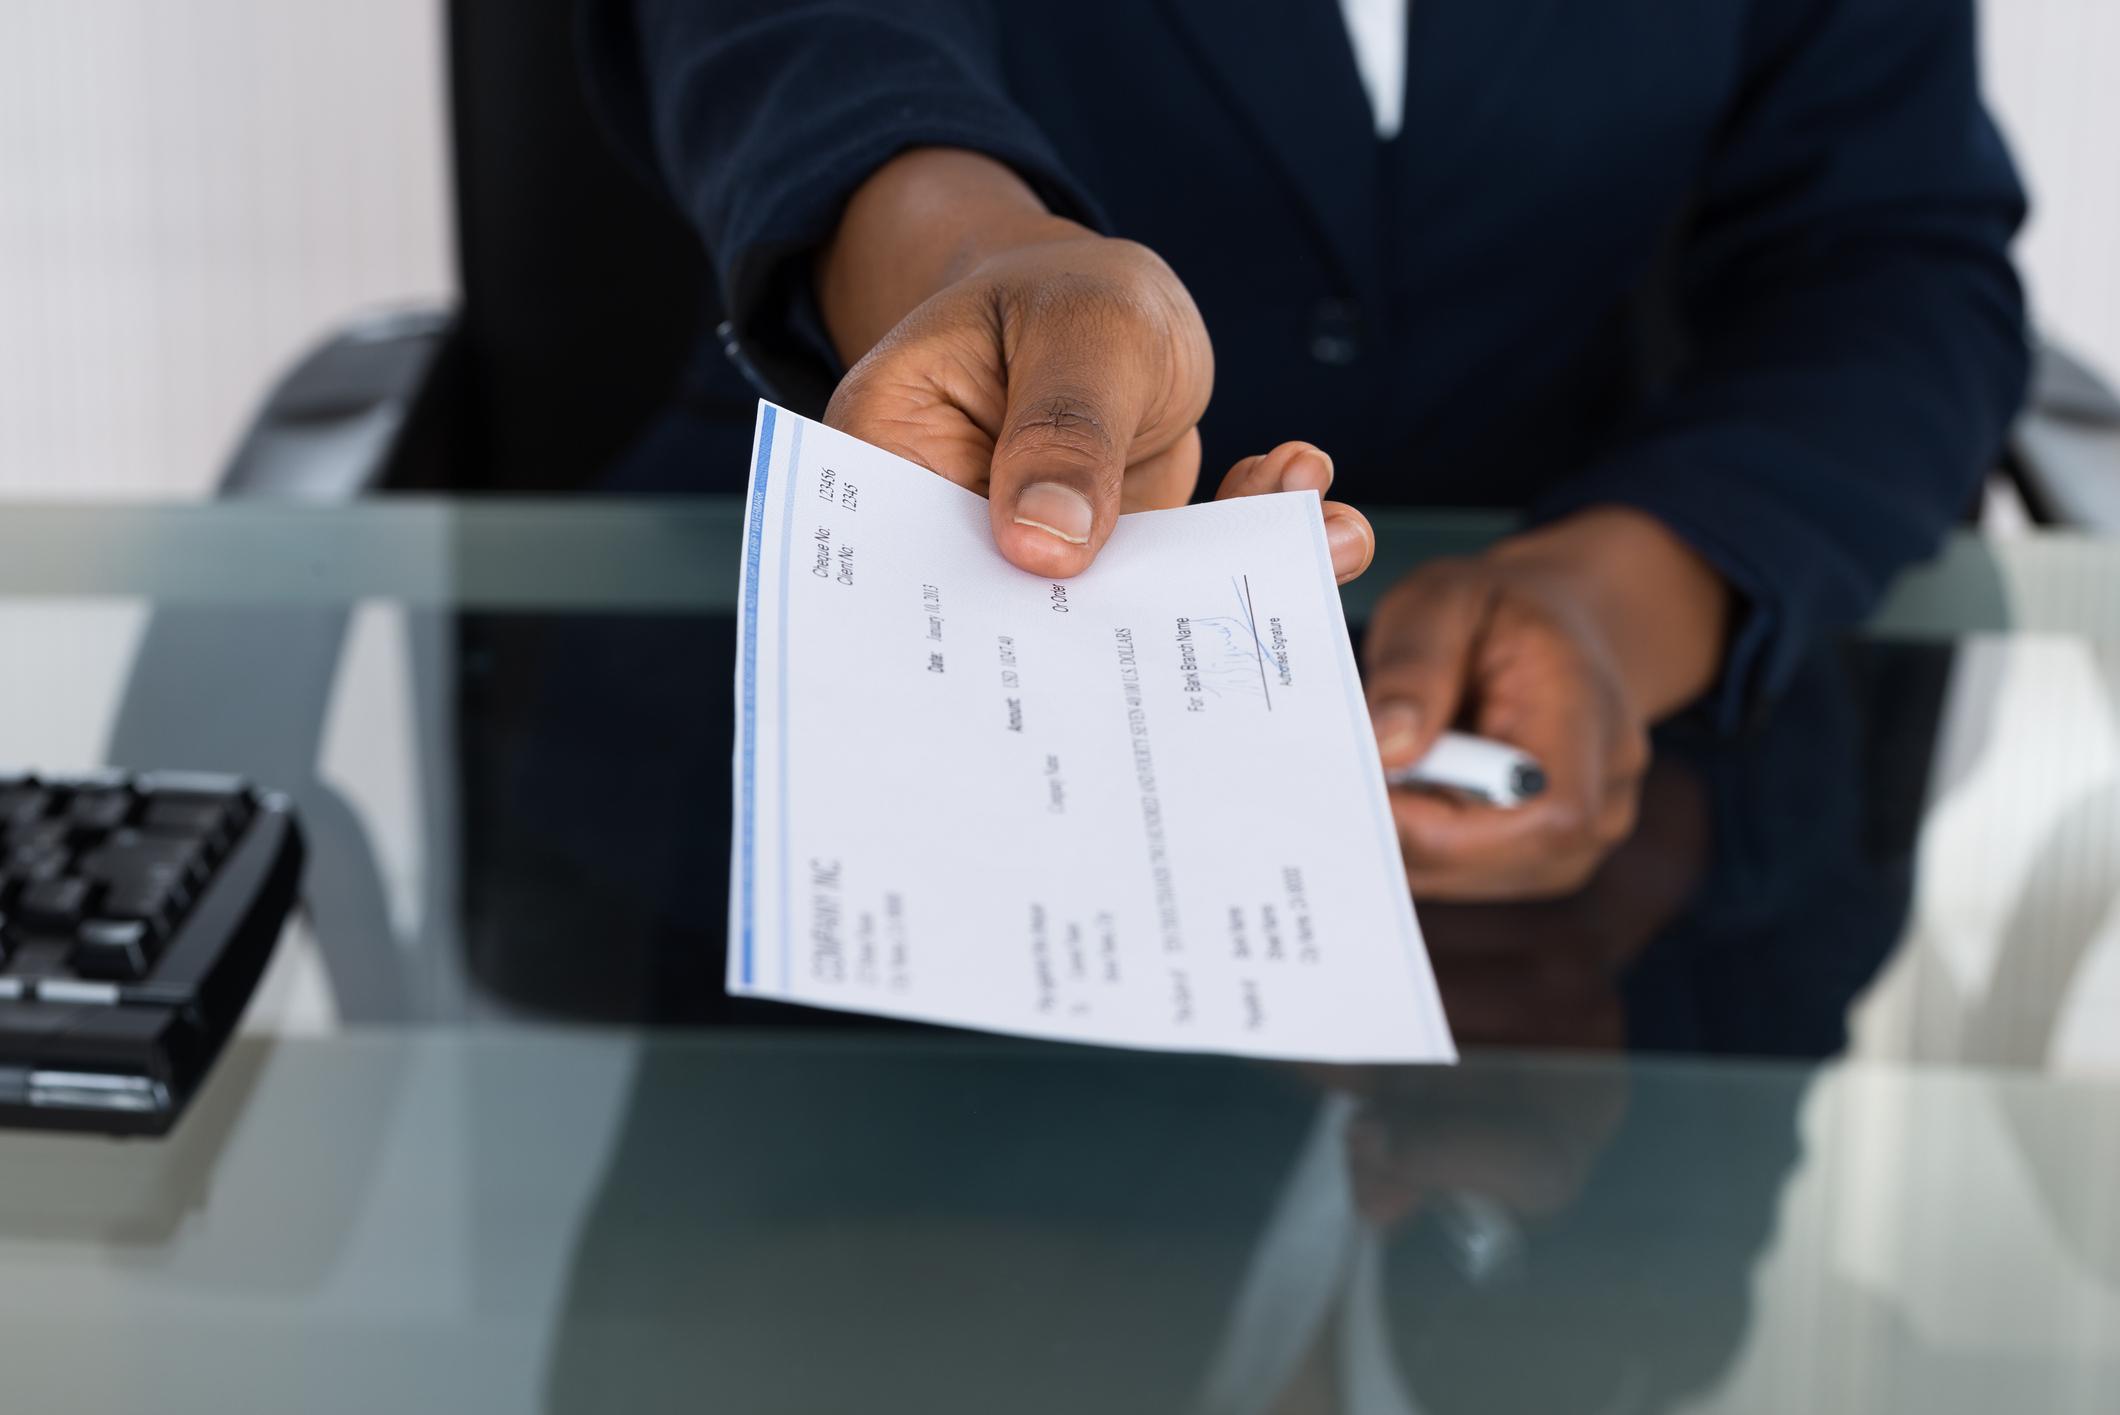 Handing over a payroll check.